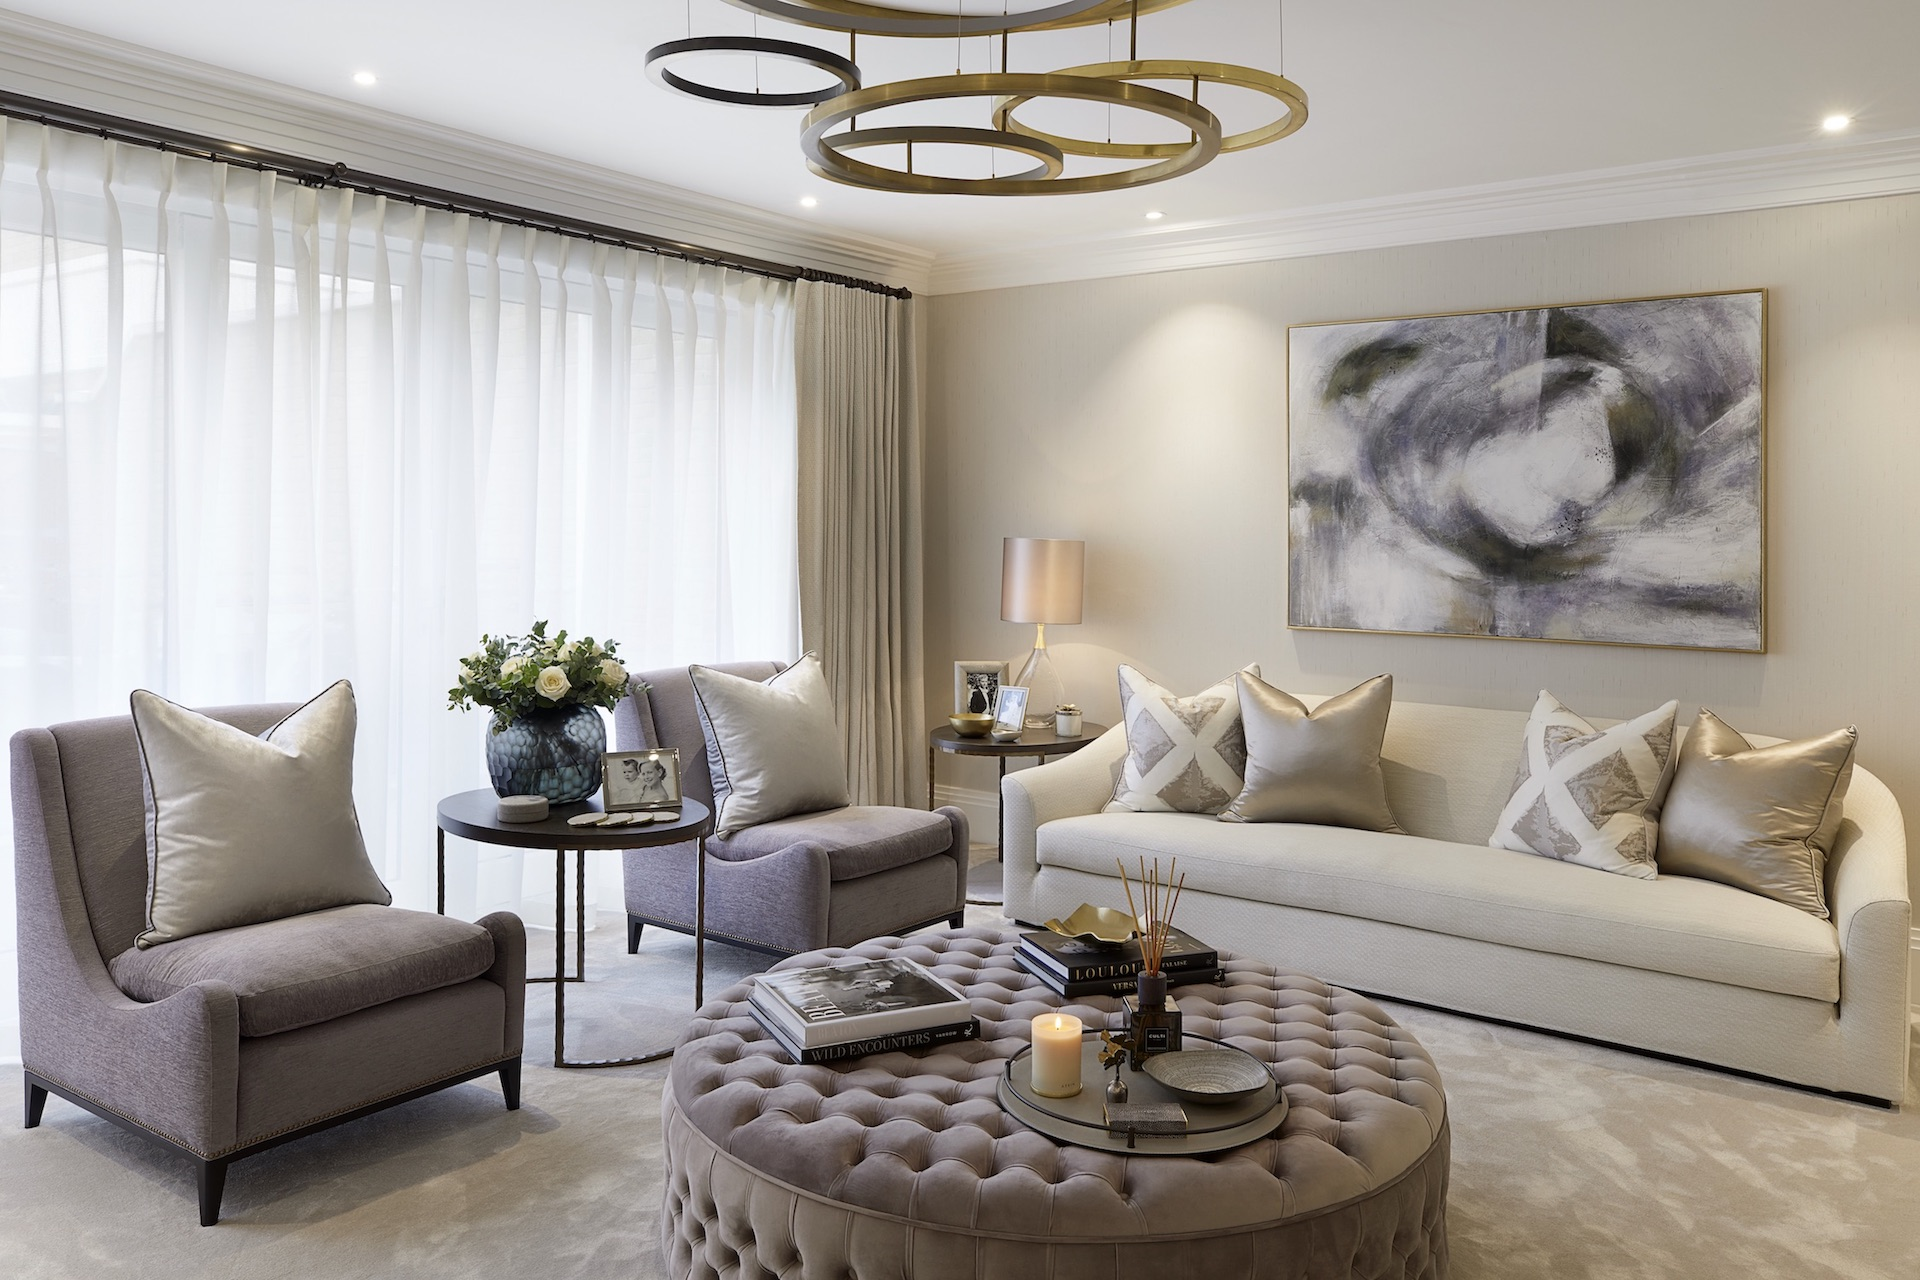 Q a with laura hammett laura hammett interiors - How much do interior designers make a year ...